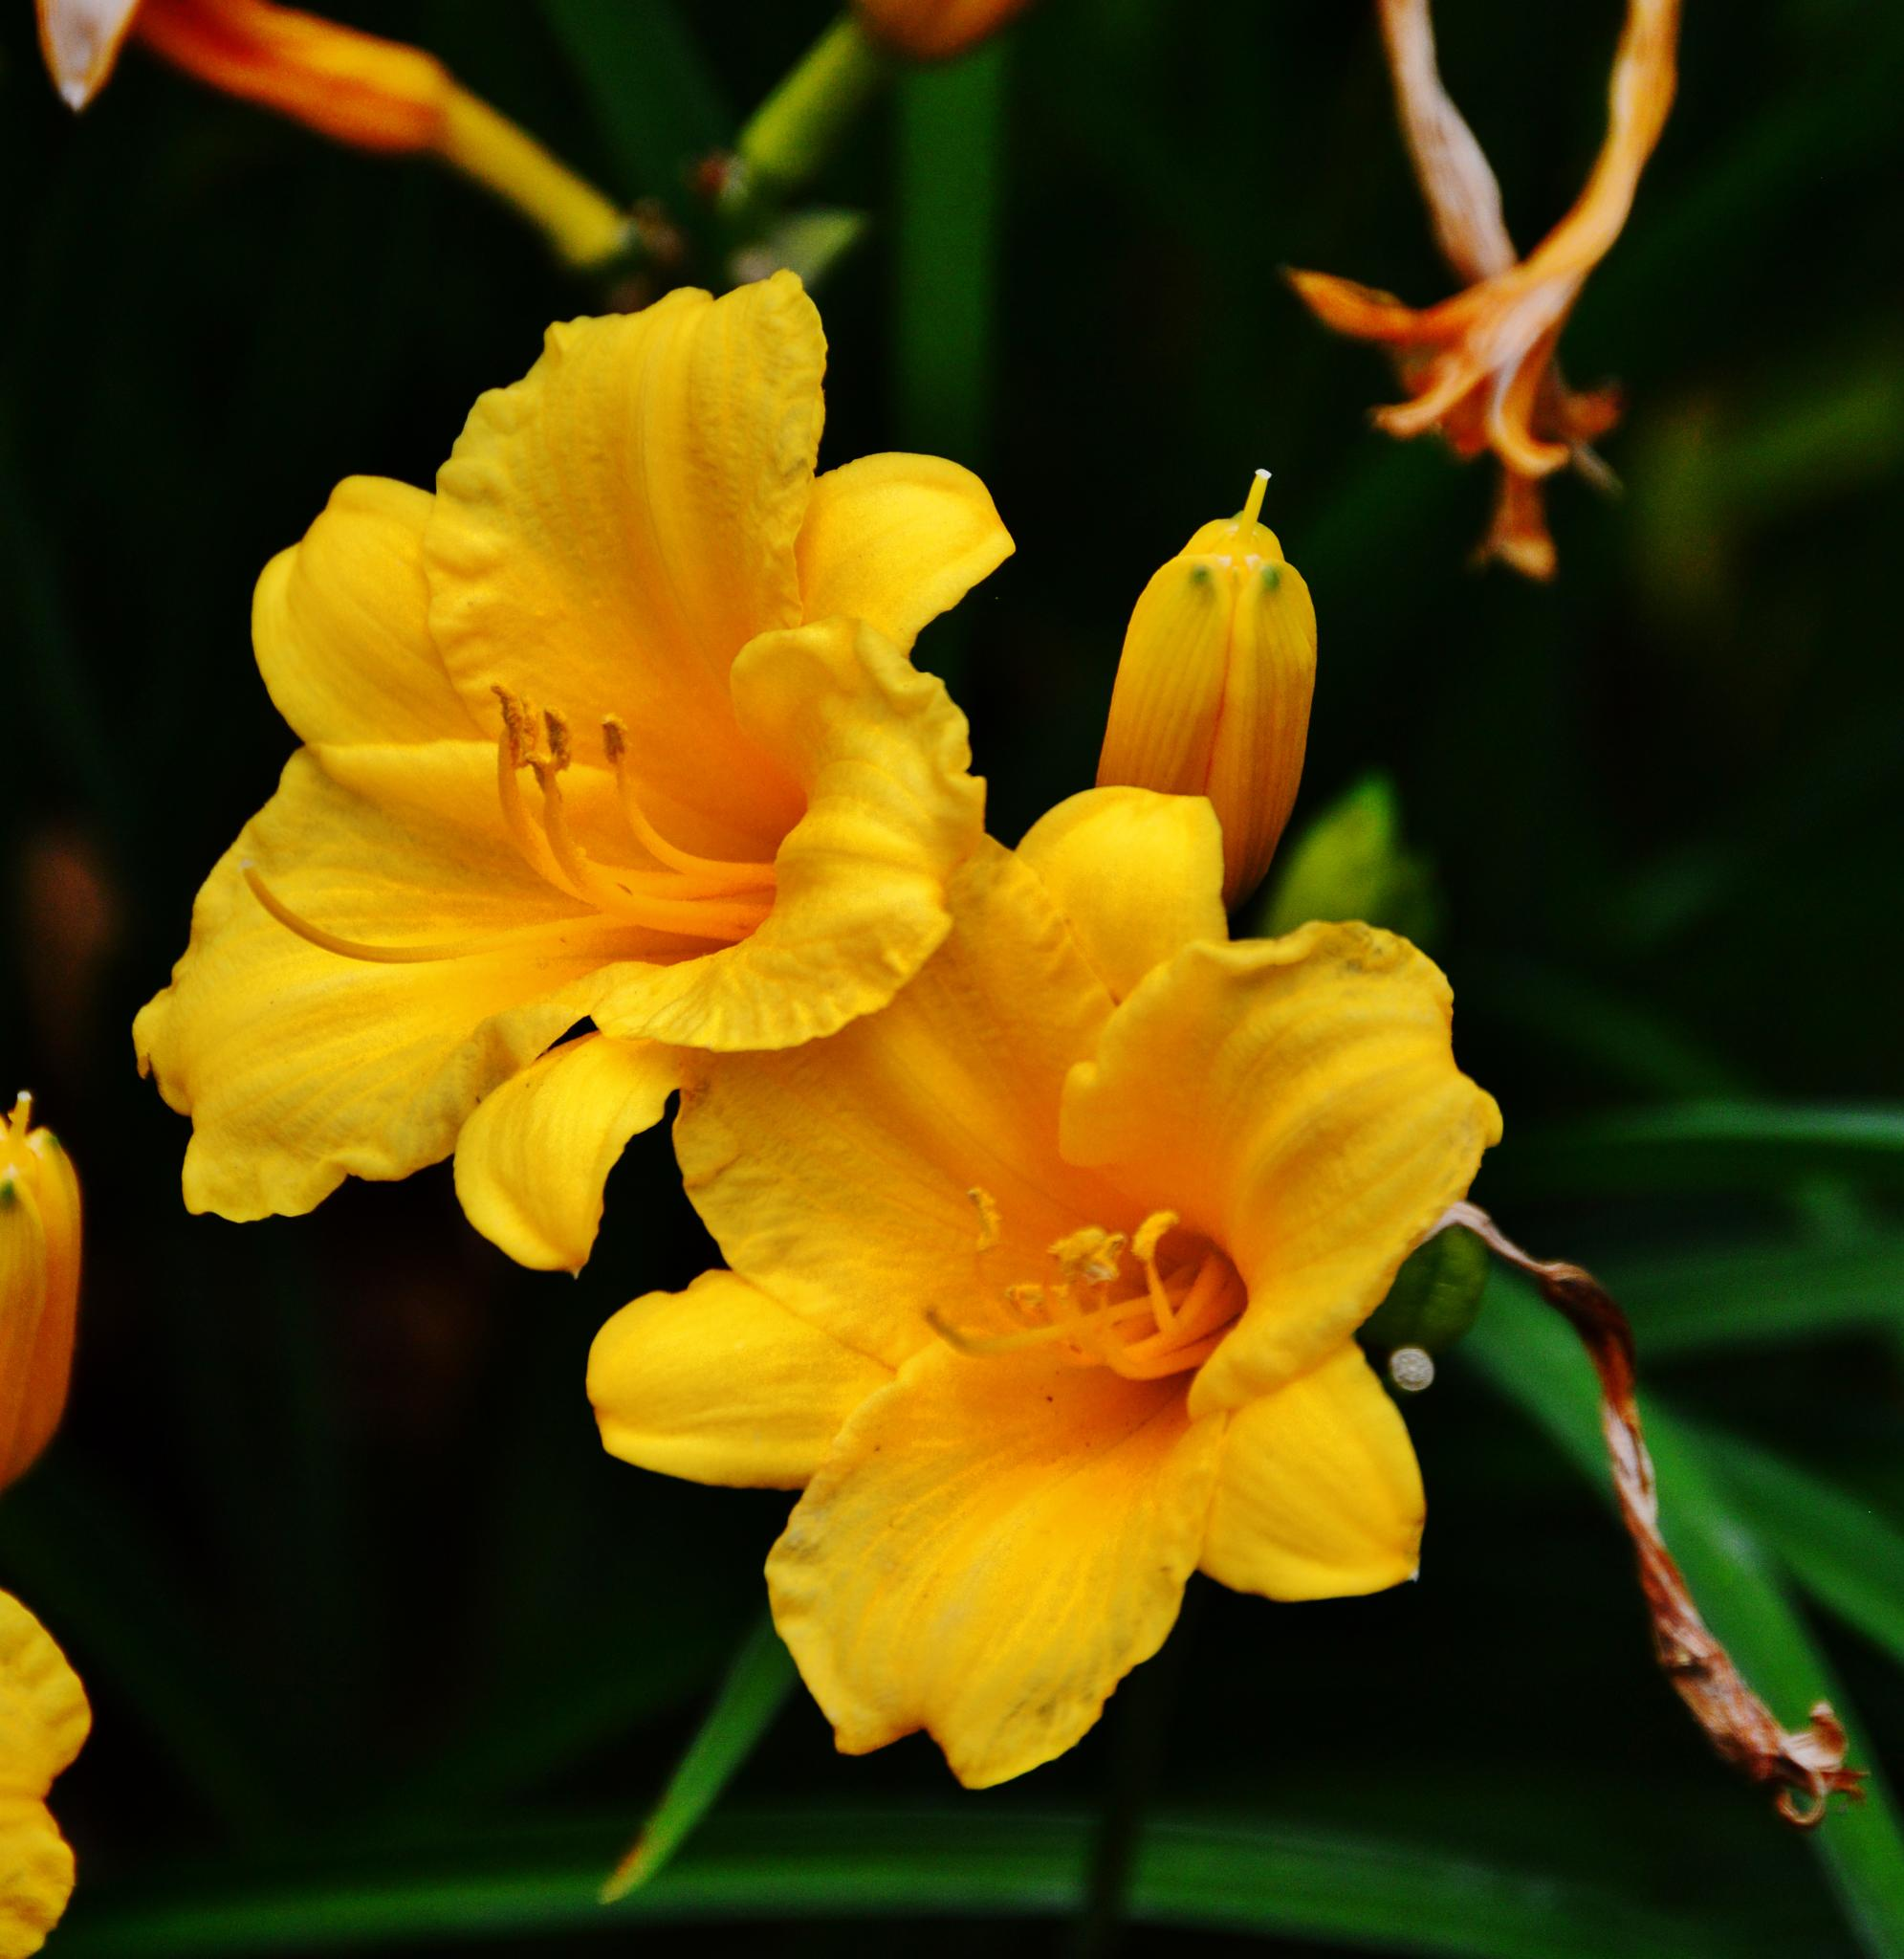 Flowers by Doug Fosnight